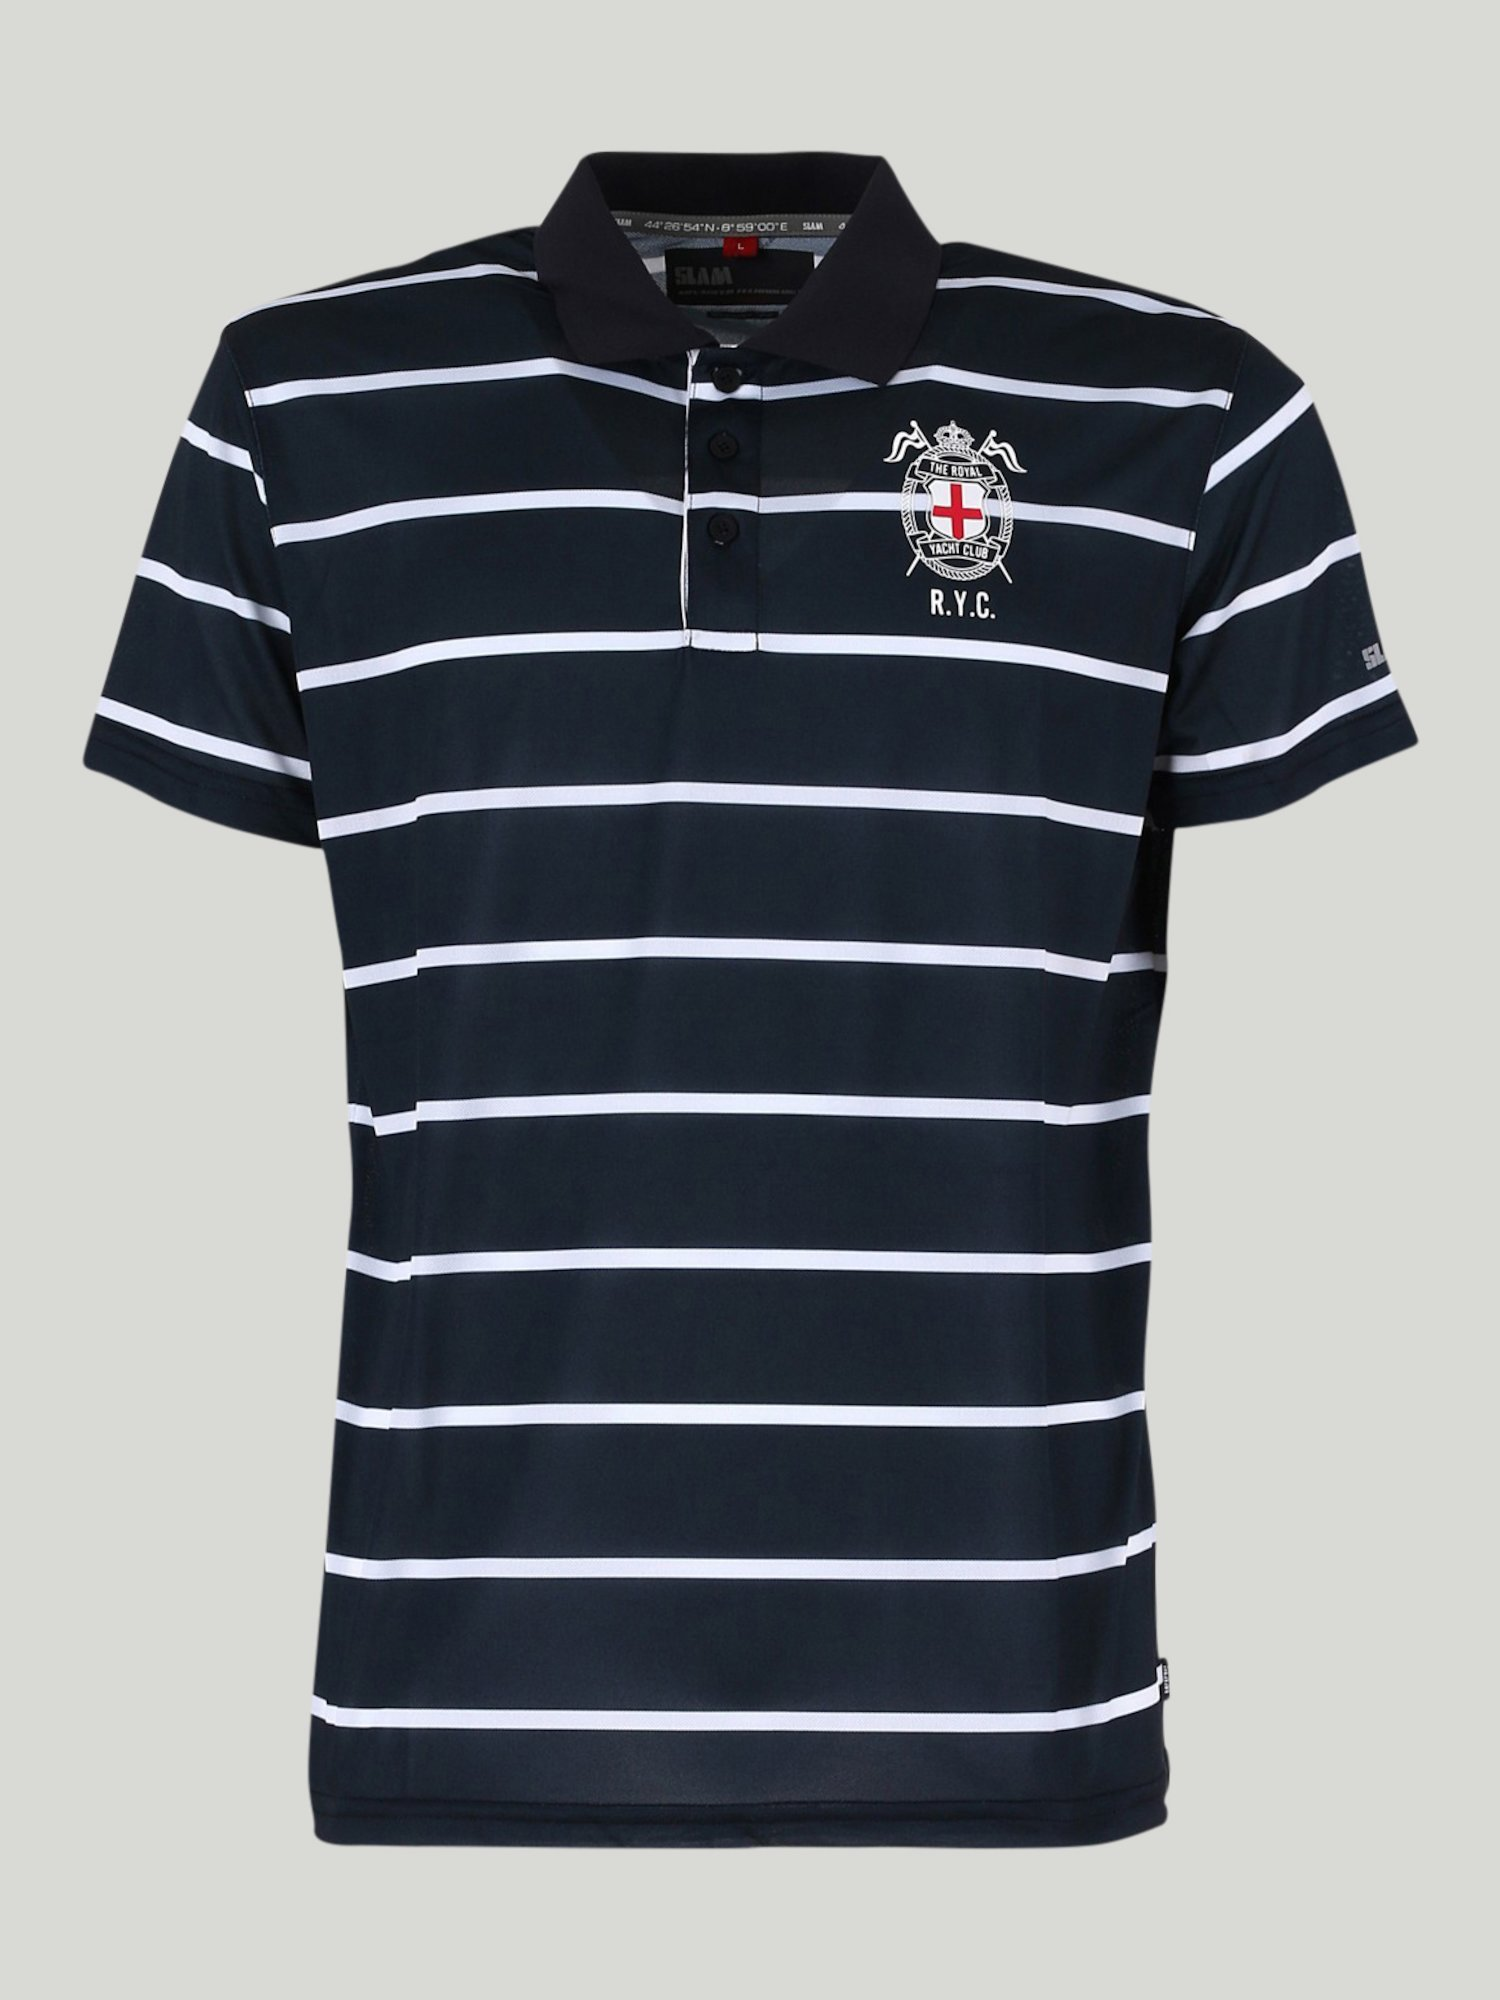 8761fb525f6 Catcher polo shirt - Navy